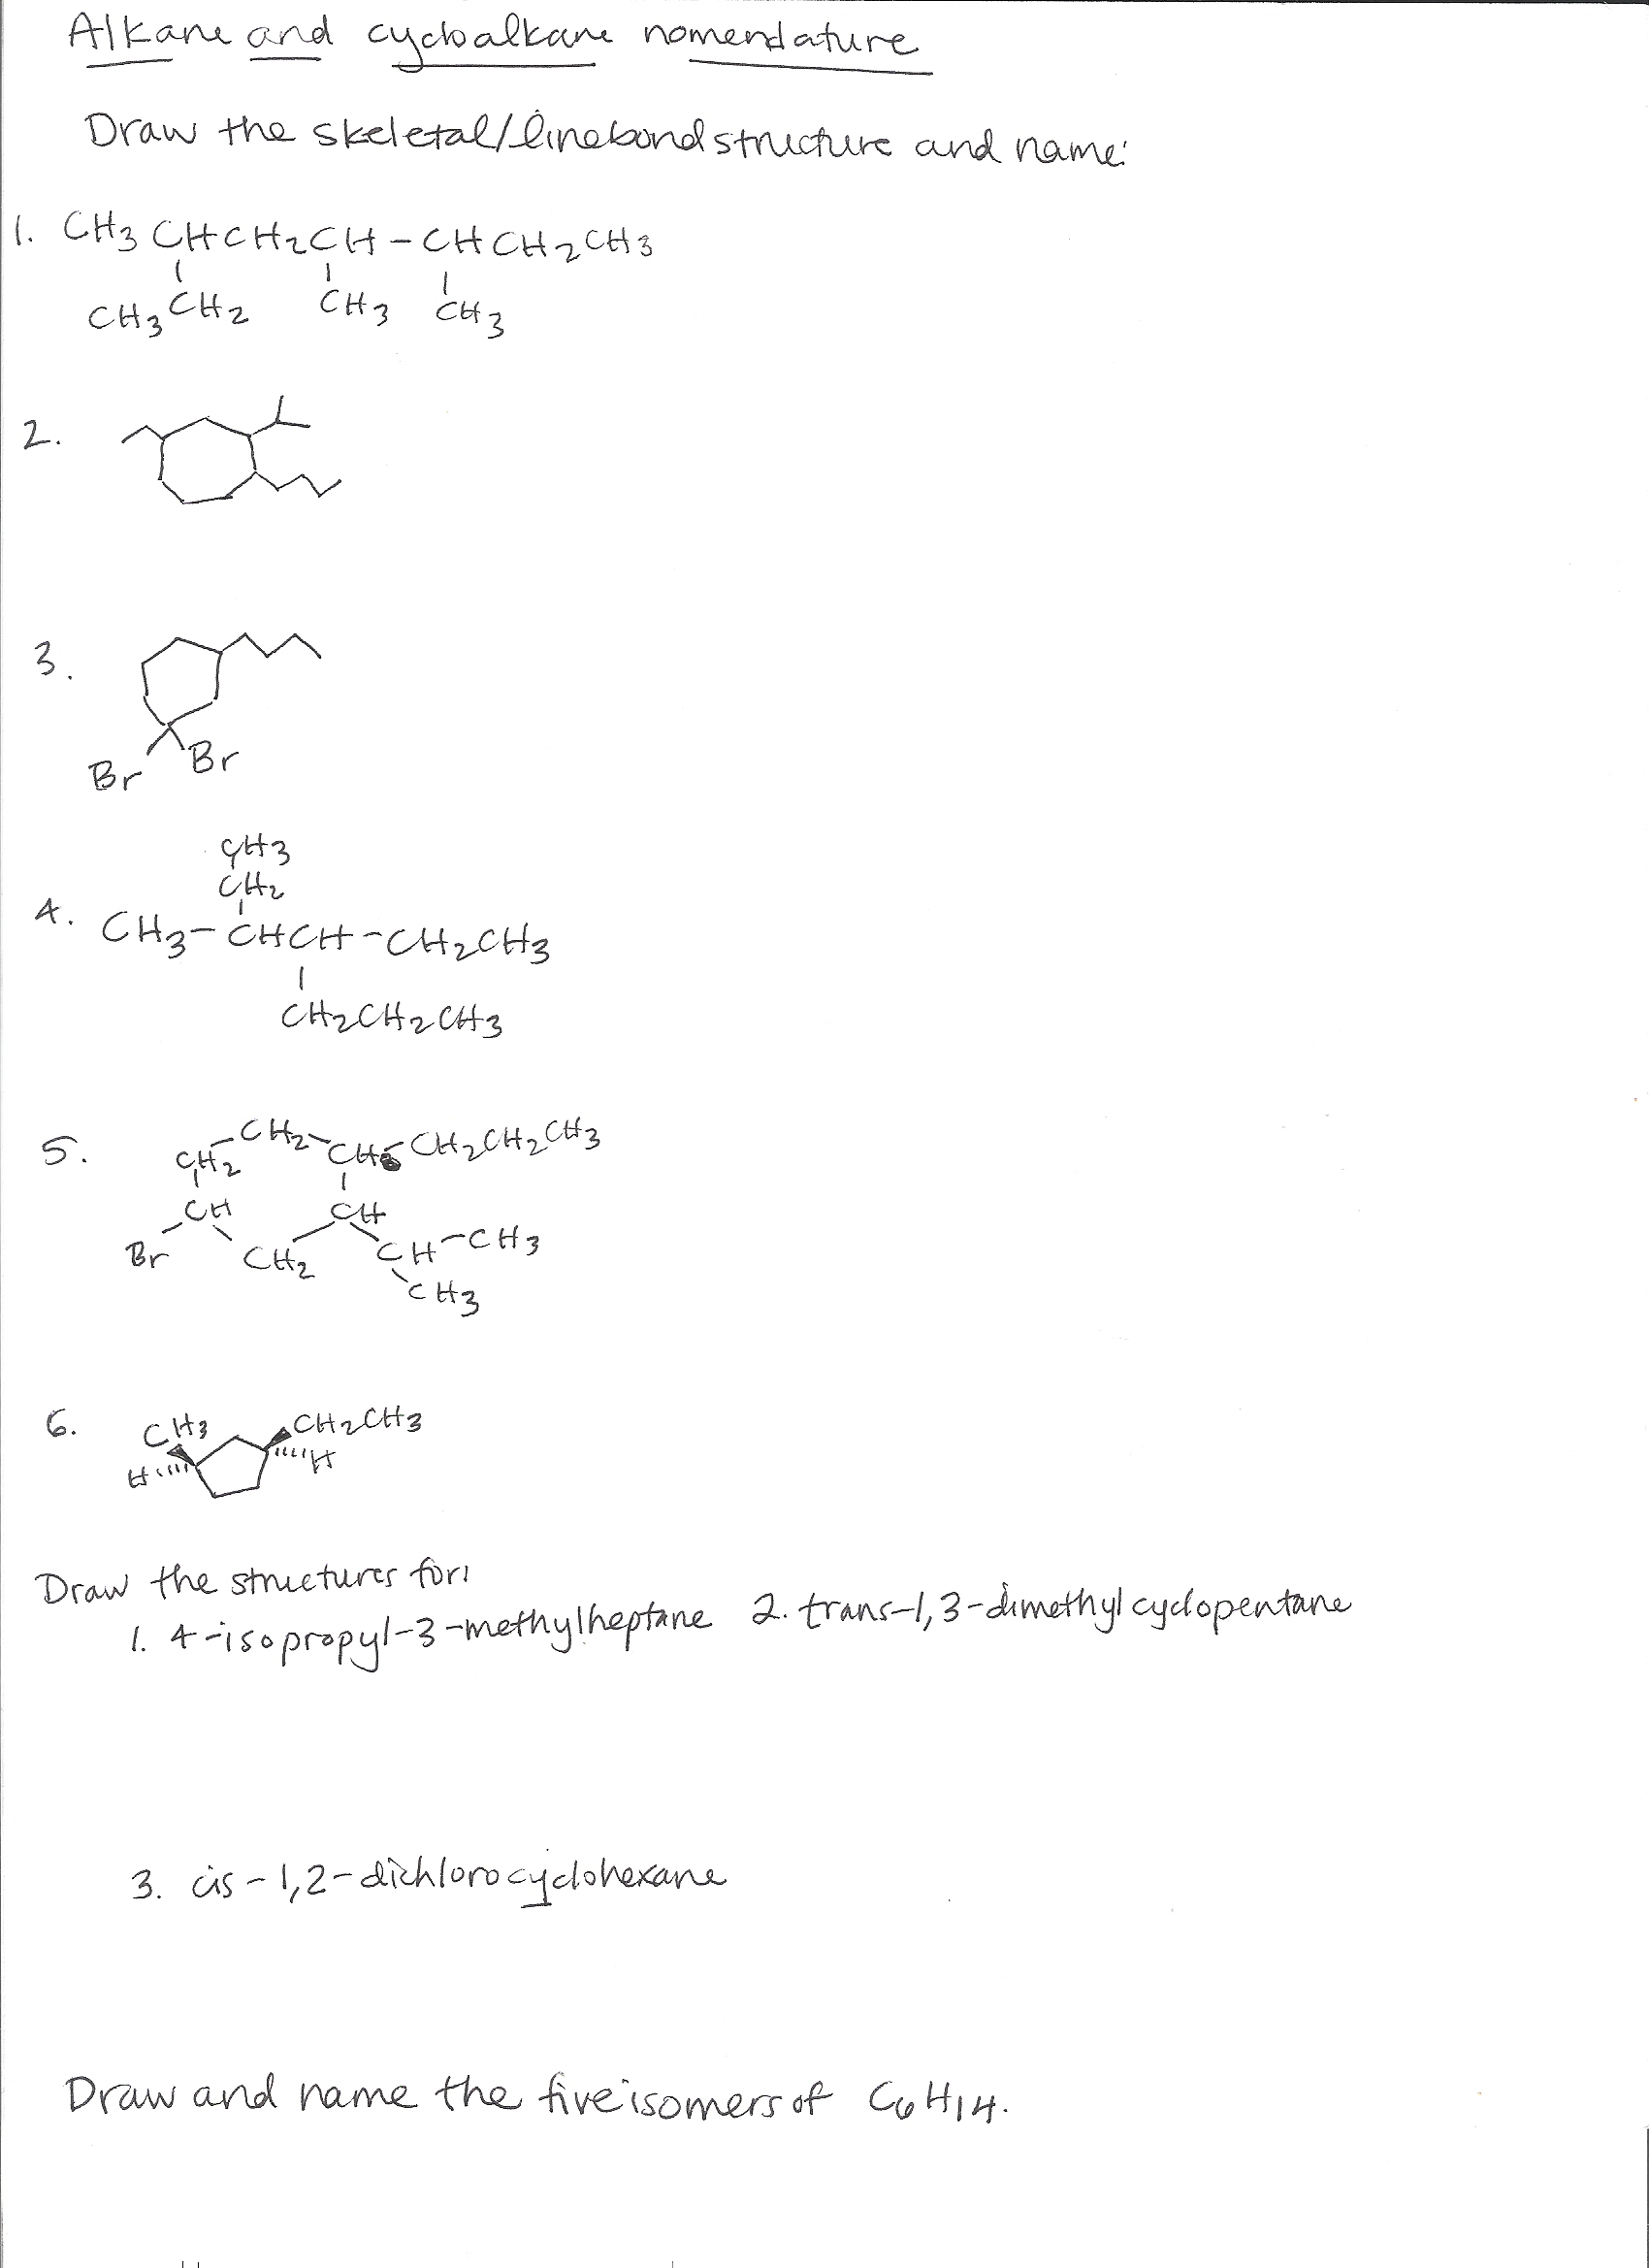 Iupac Nomenclature Of Organic Chemistry Alkanes Charts Images Gt Gt Iupac Nomenclature Of